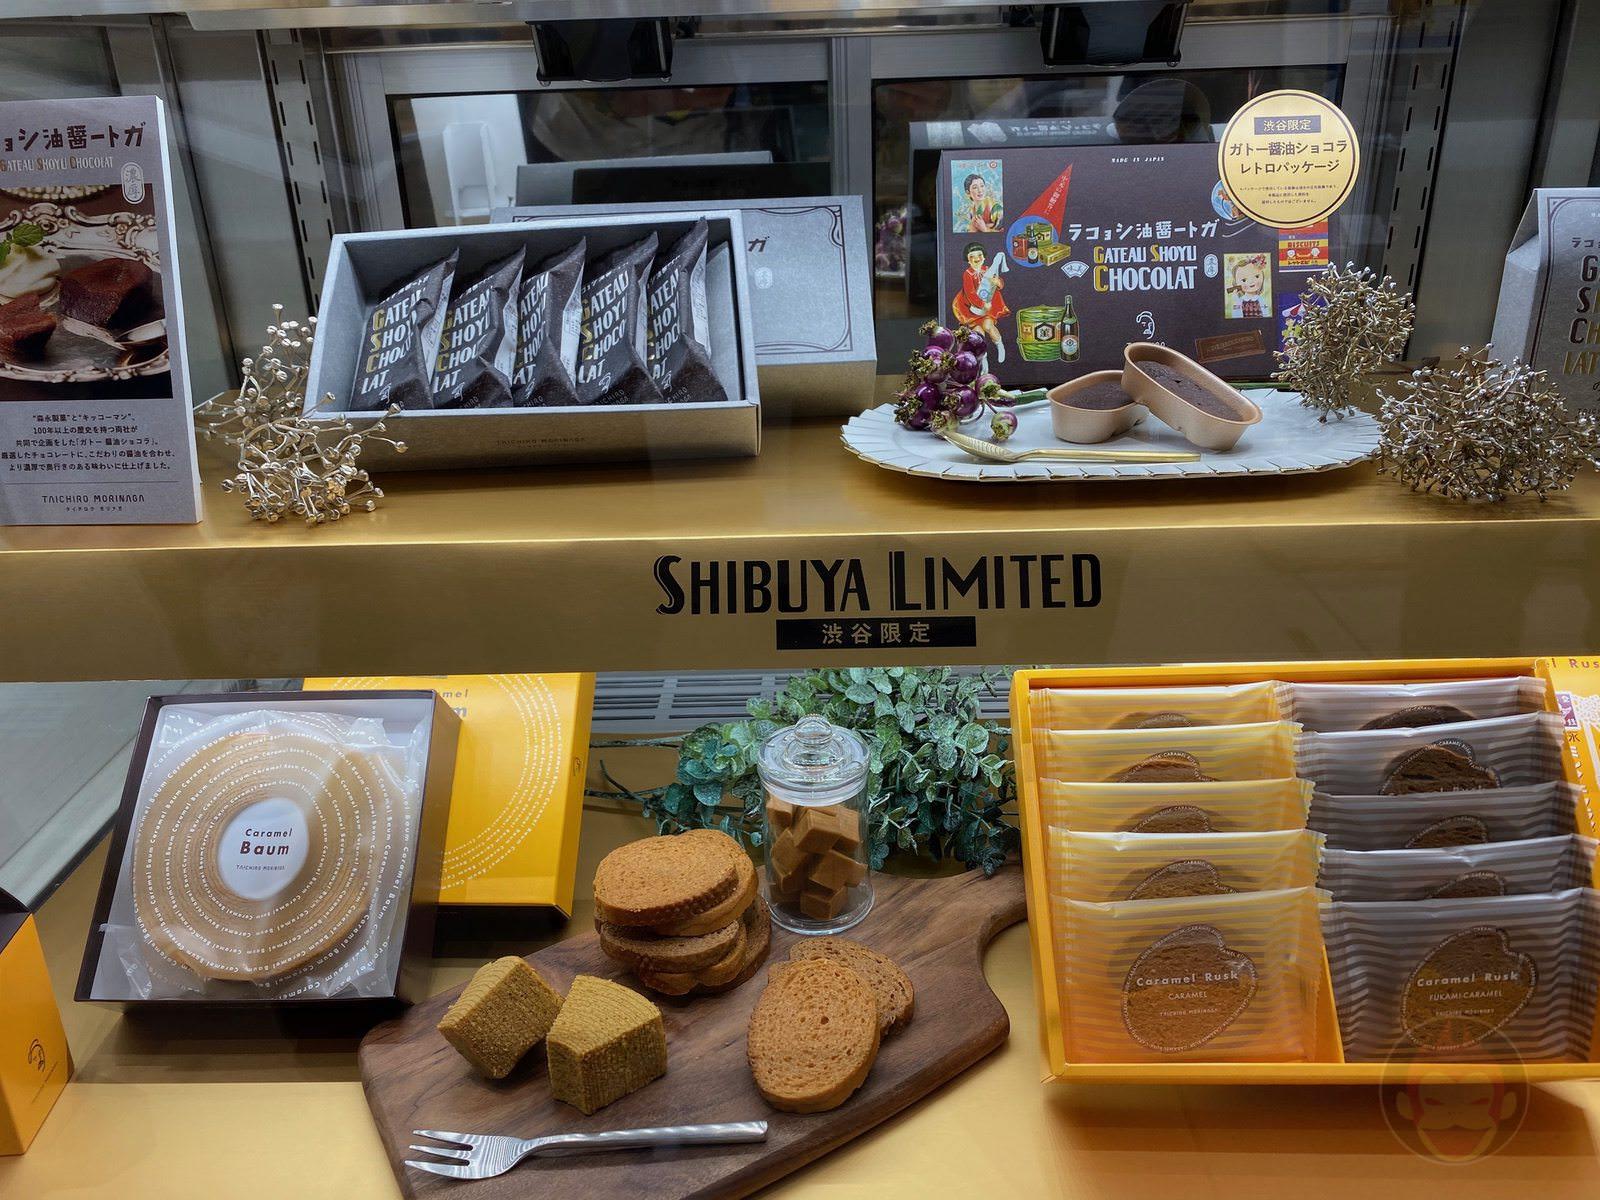 Shibuya-Scramble-Square-Food-I-Ate-51.jpeg